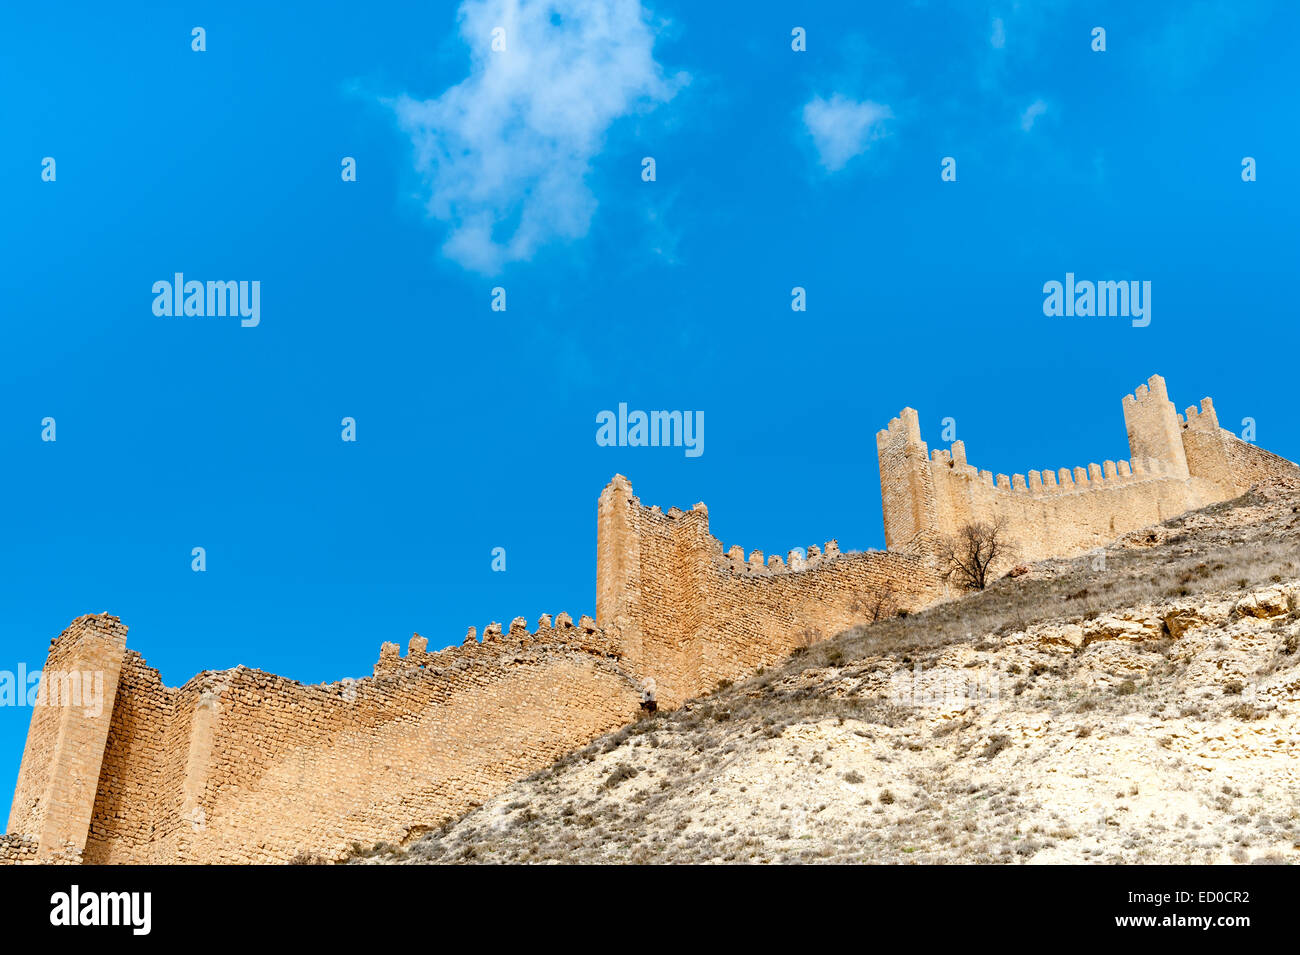 Spain, Aragon, Teruel Province, Albarracin, Fortified wall against blue sky - Stock Image